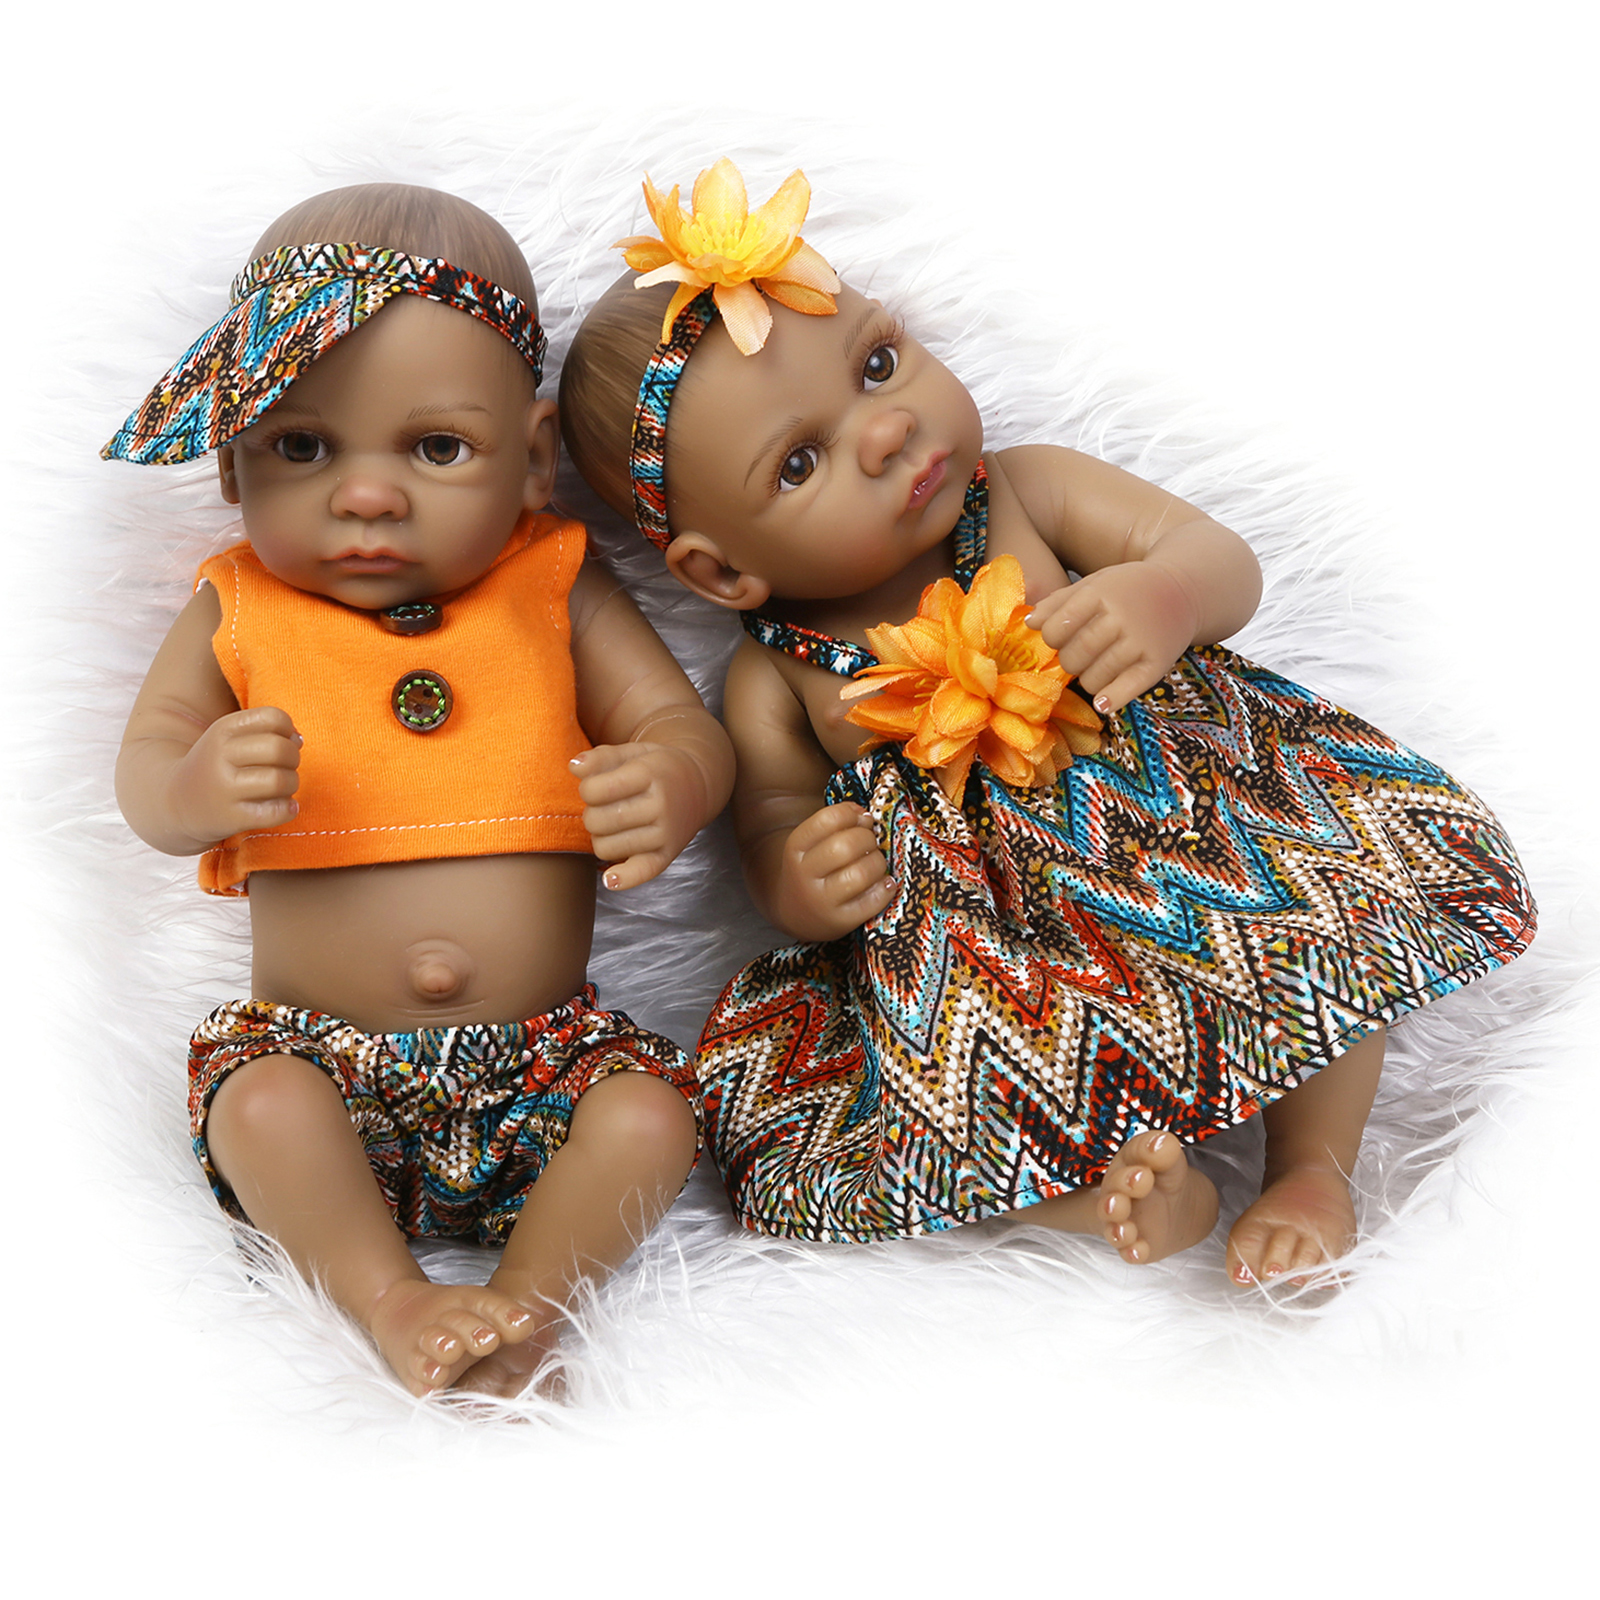 12 Inch vinyl Black Reborn Doll For Kids Toys Silicone Reborn Baby